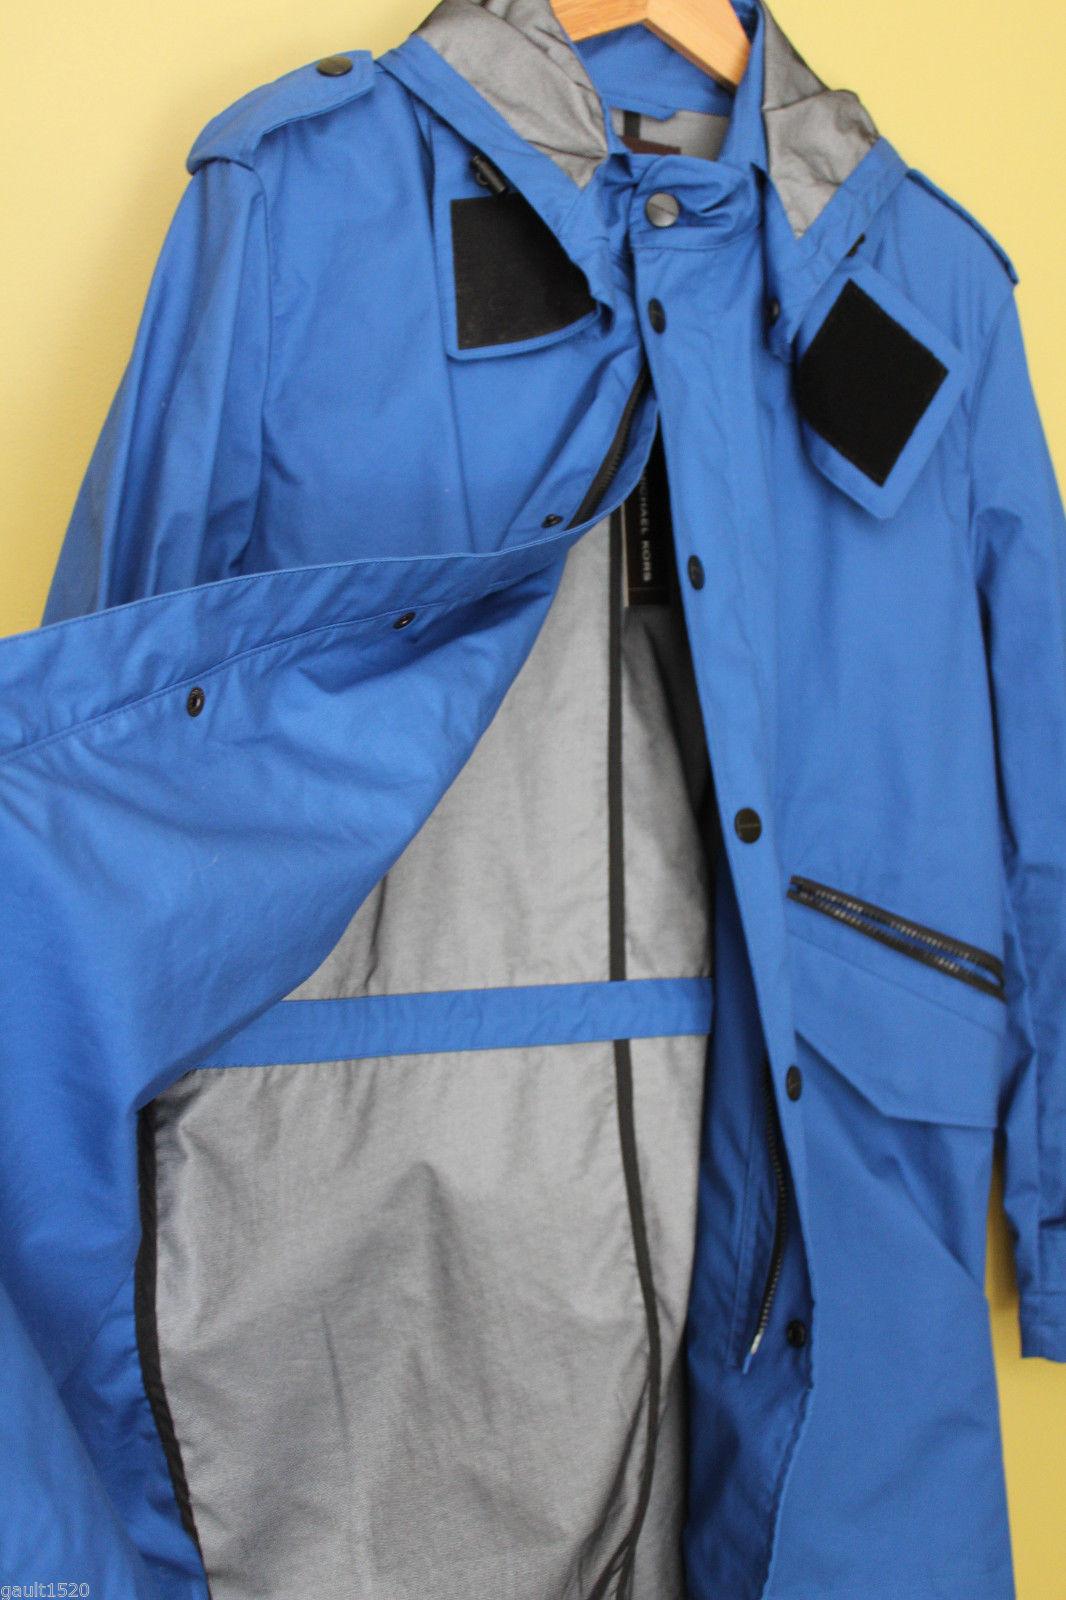 NWT Michael Kors Designer Men's Royal Blue Long Parka Hooded Jacket Coat L $395